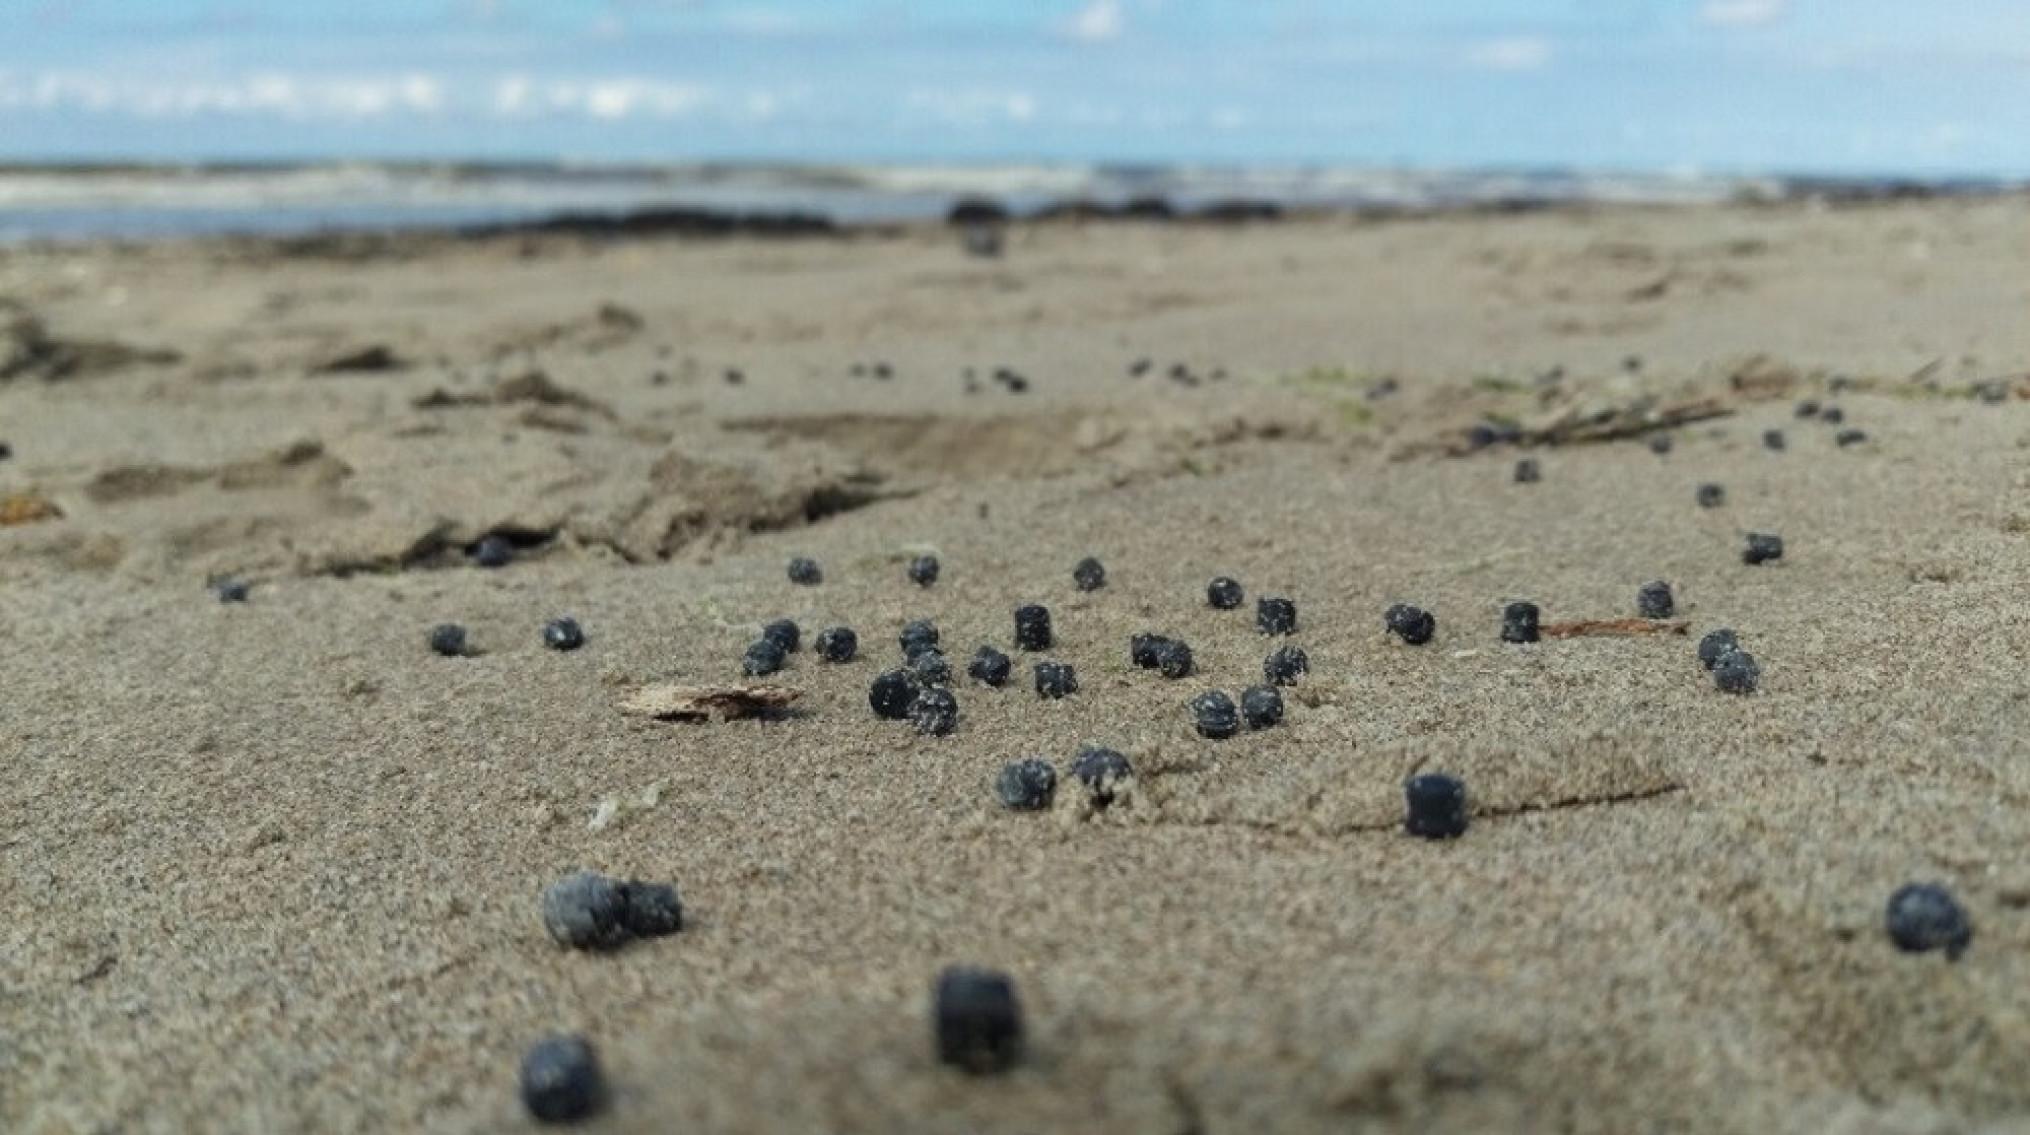 Granulaat-pellets-strandafval-zwerfvuil-1000-StichtingDeNoordzee